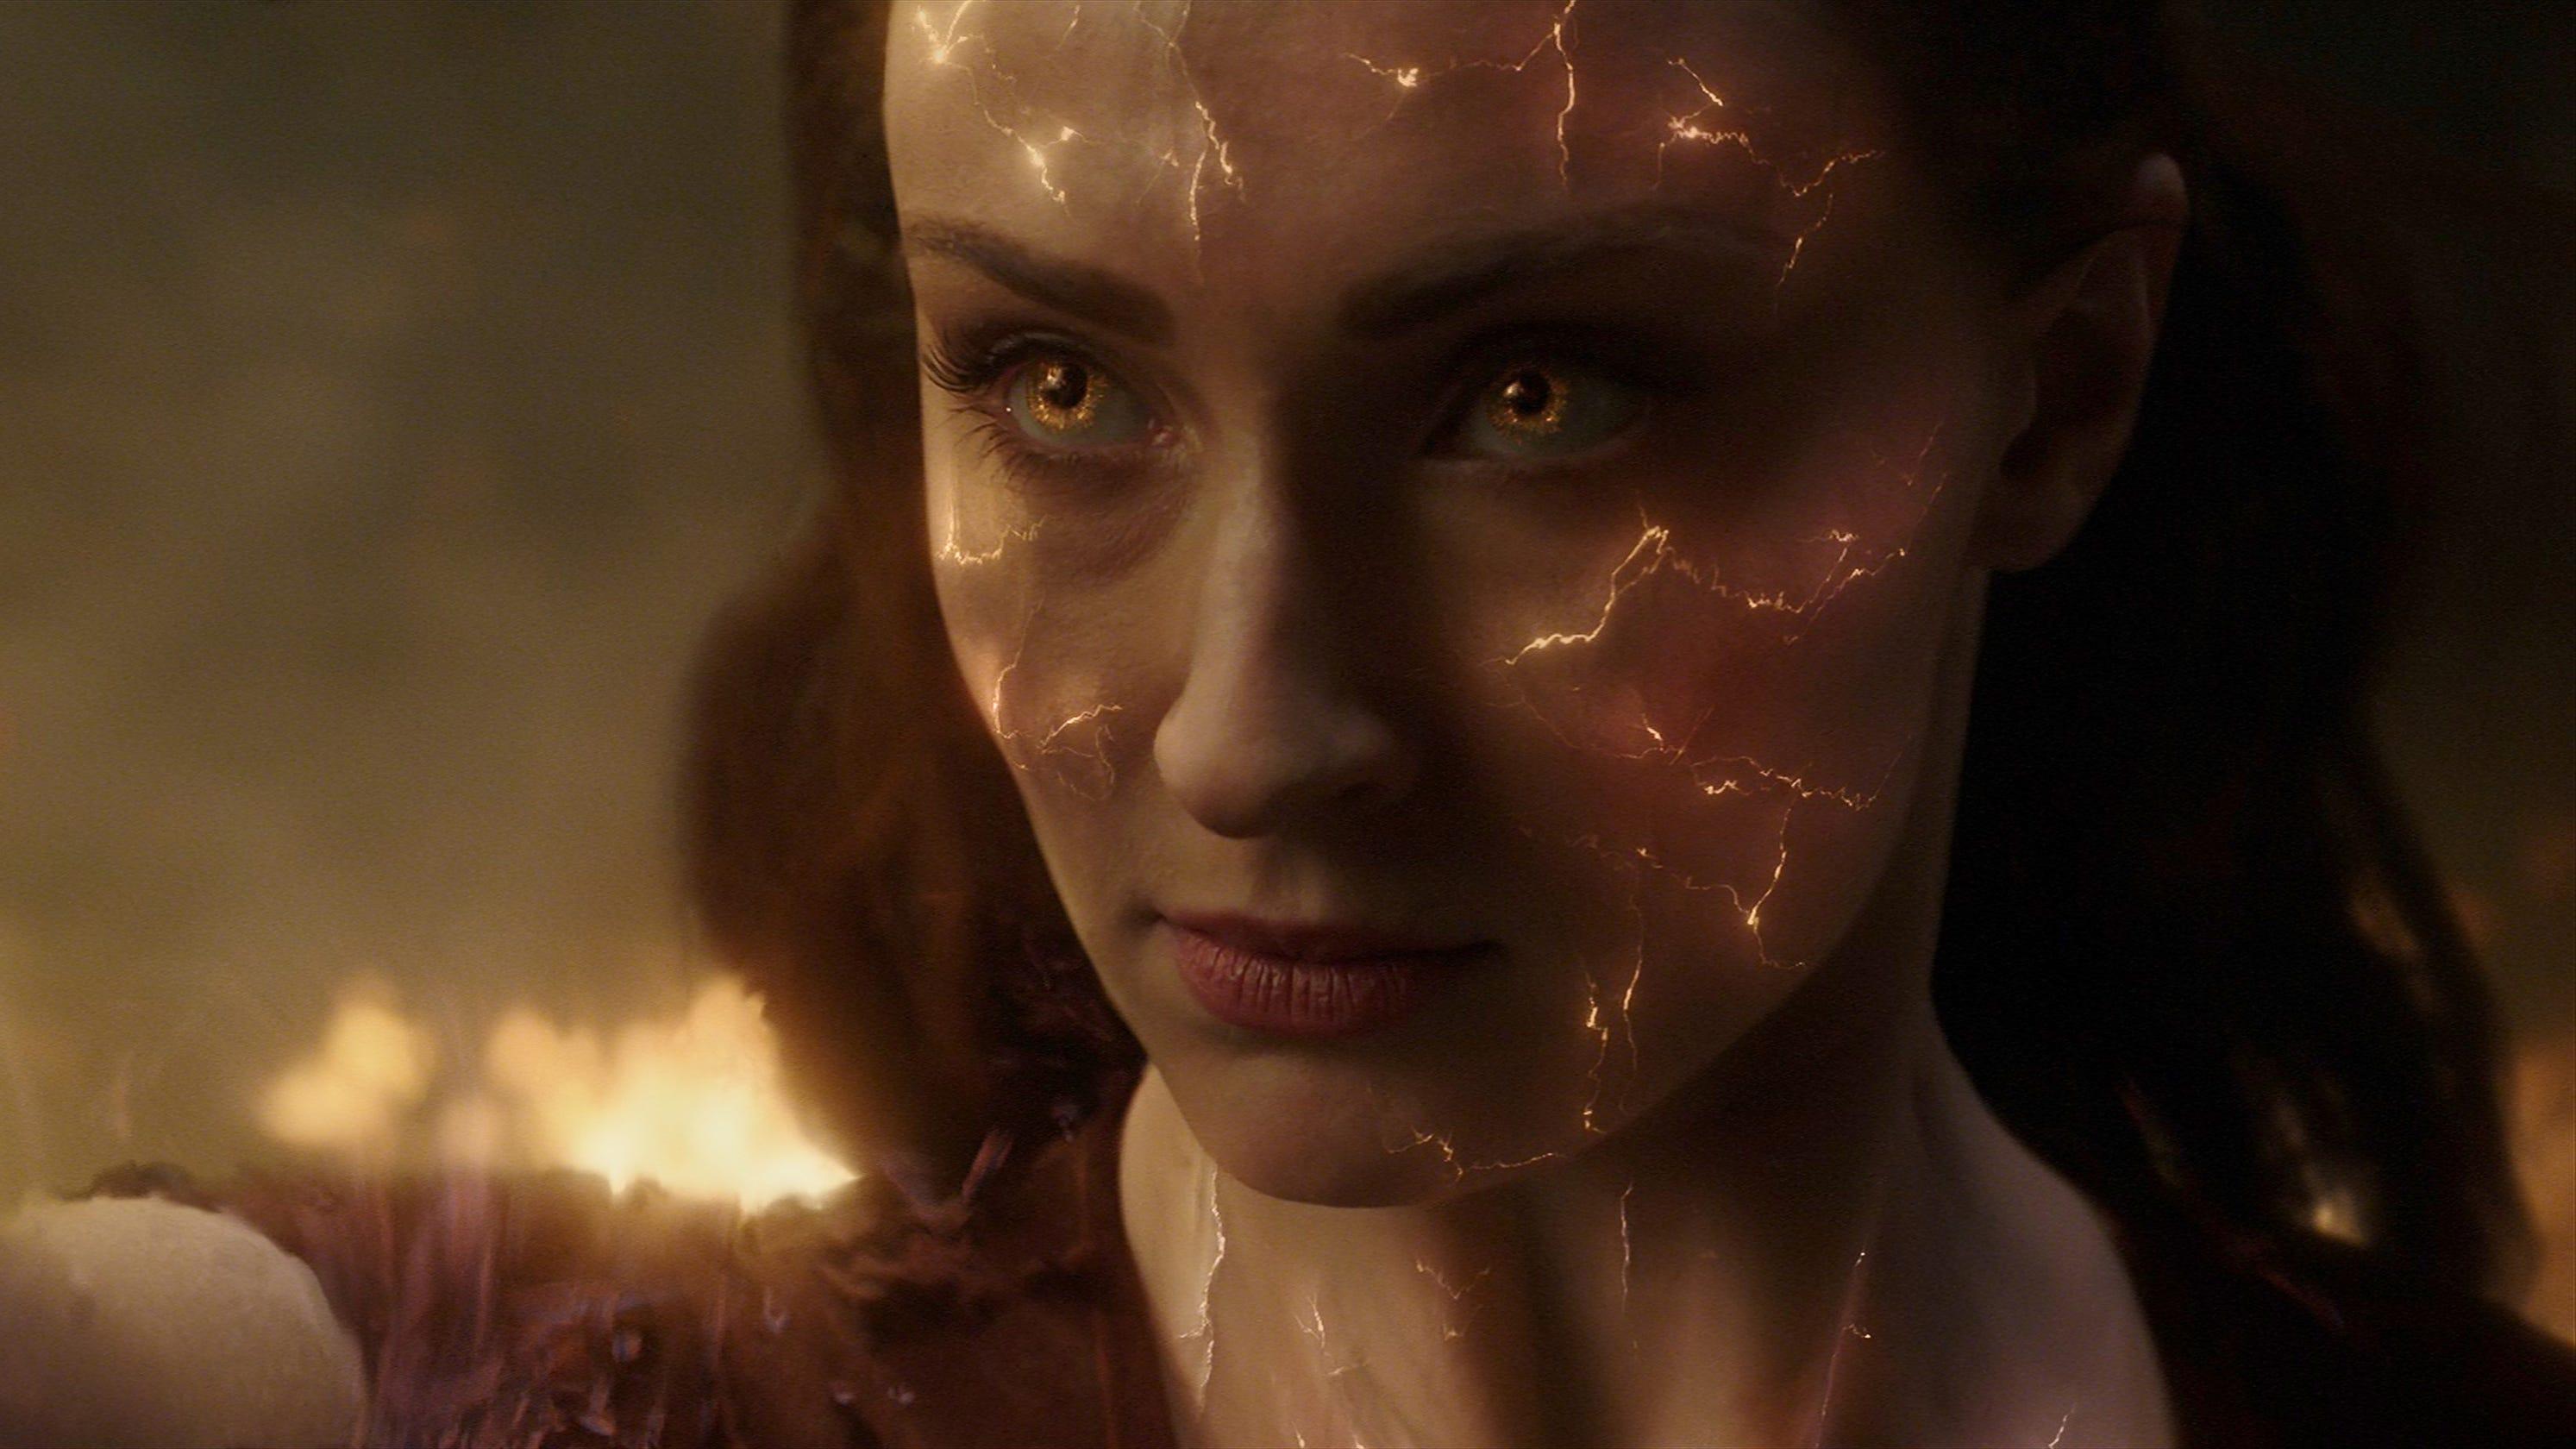 Dark Phoenix' review: X-Men's last stand is a forgettable effort